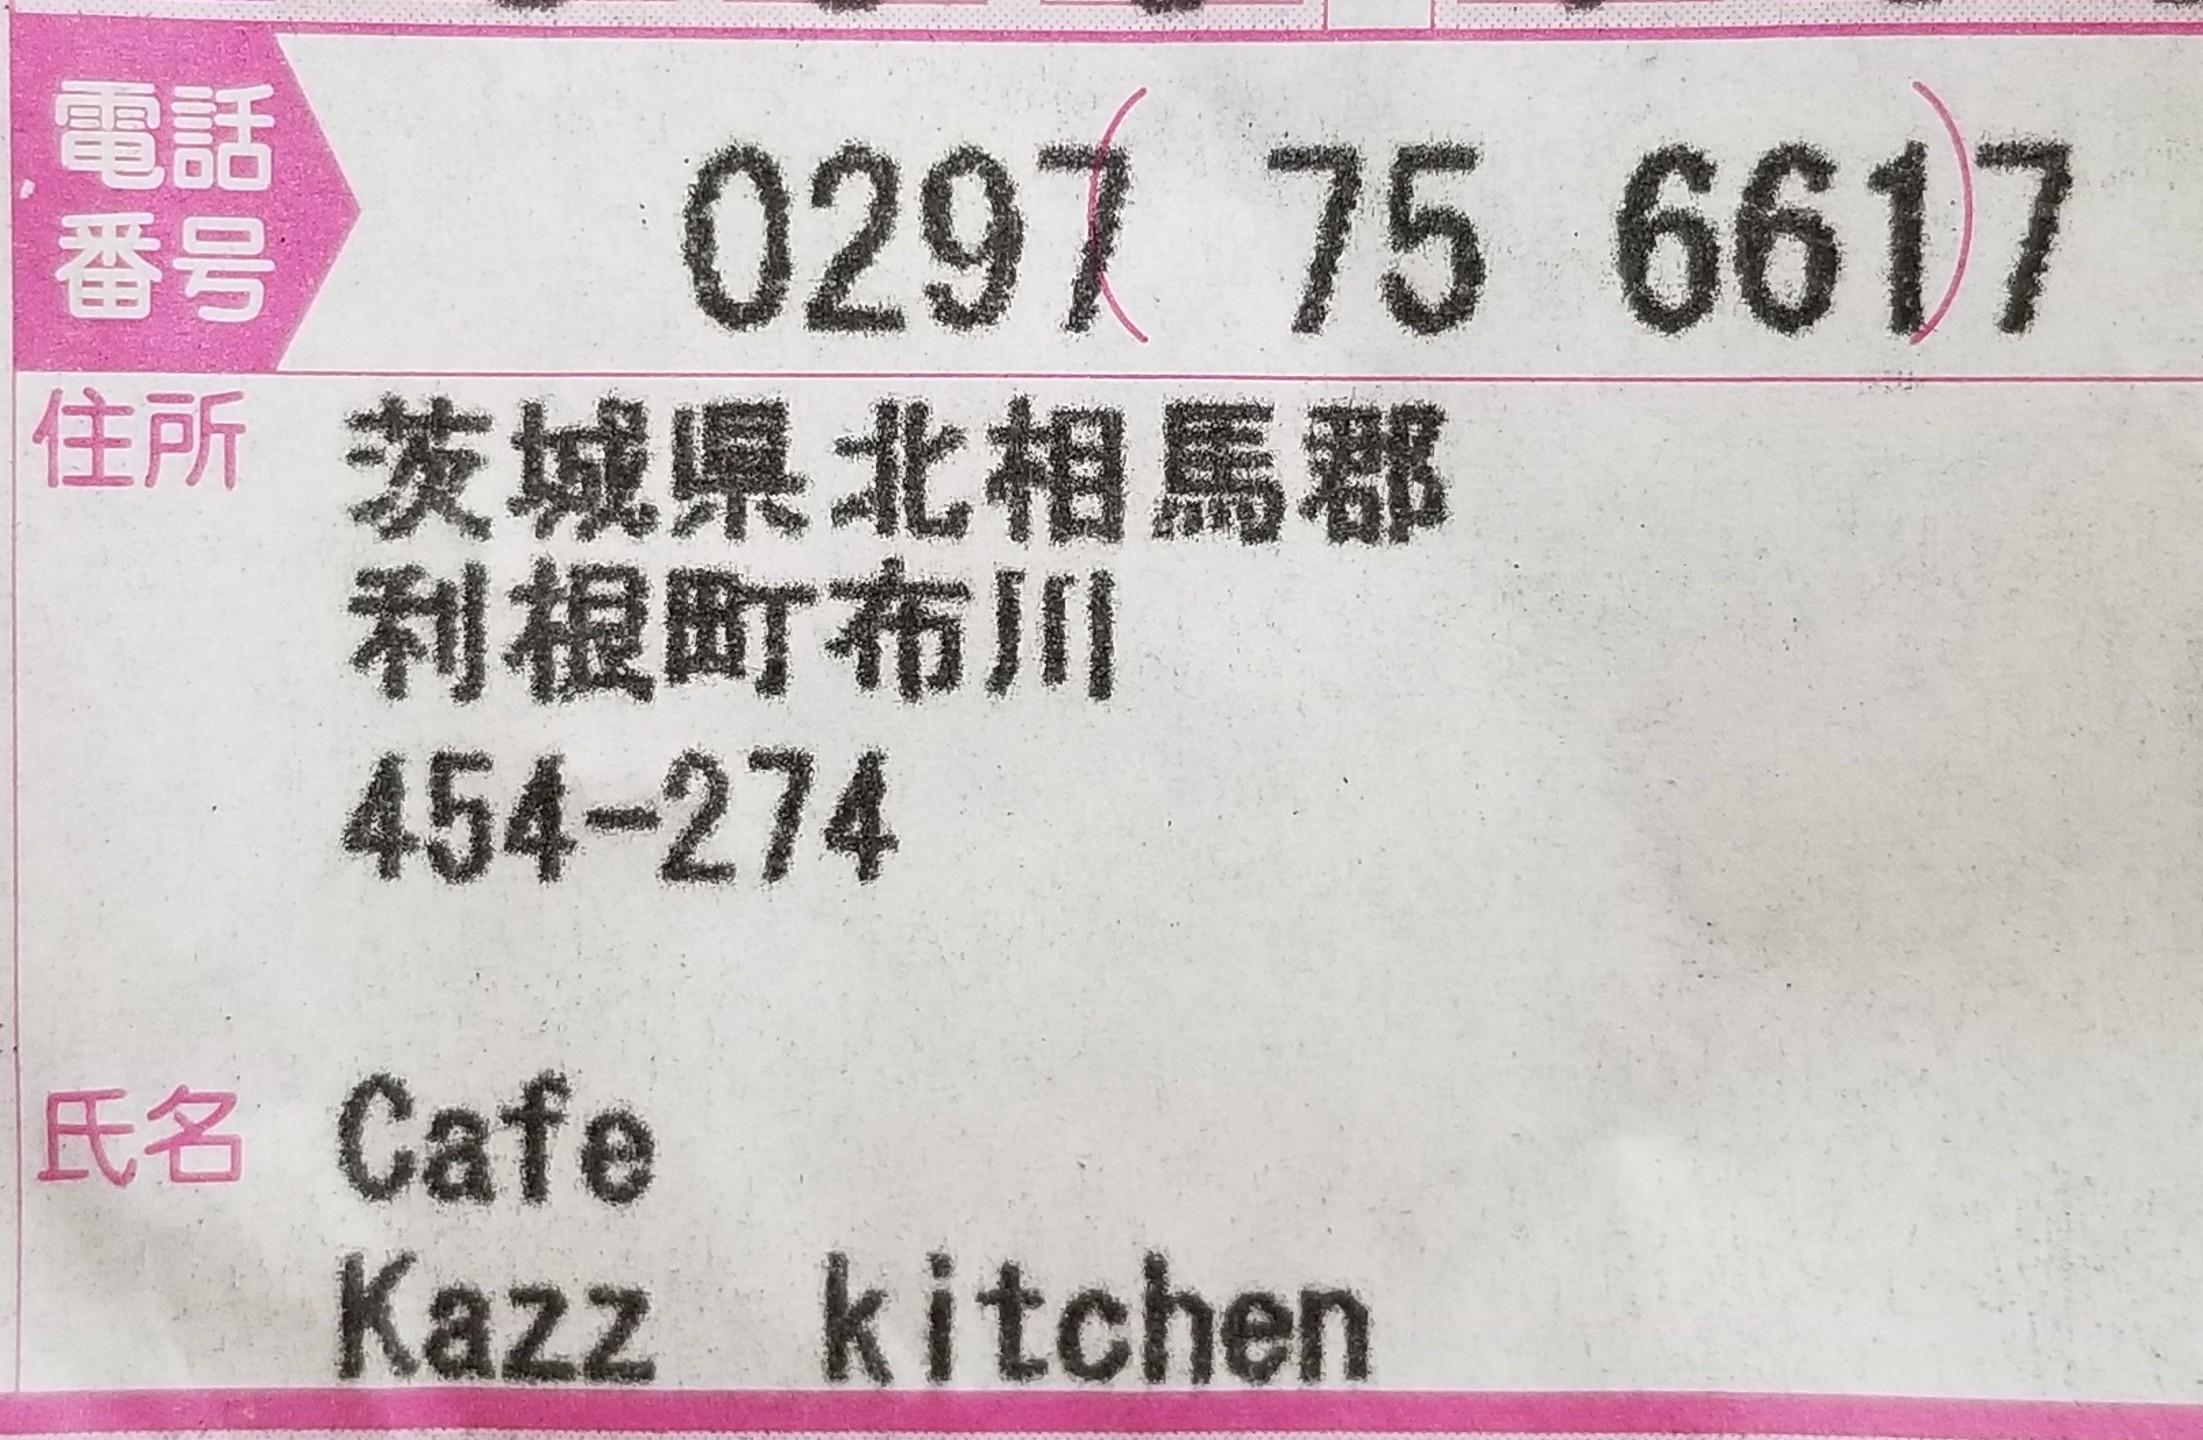 Kazzkitchen, 茨城県北相馬郡, こだわりのパン屋, 無添加, カフェ